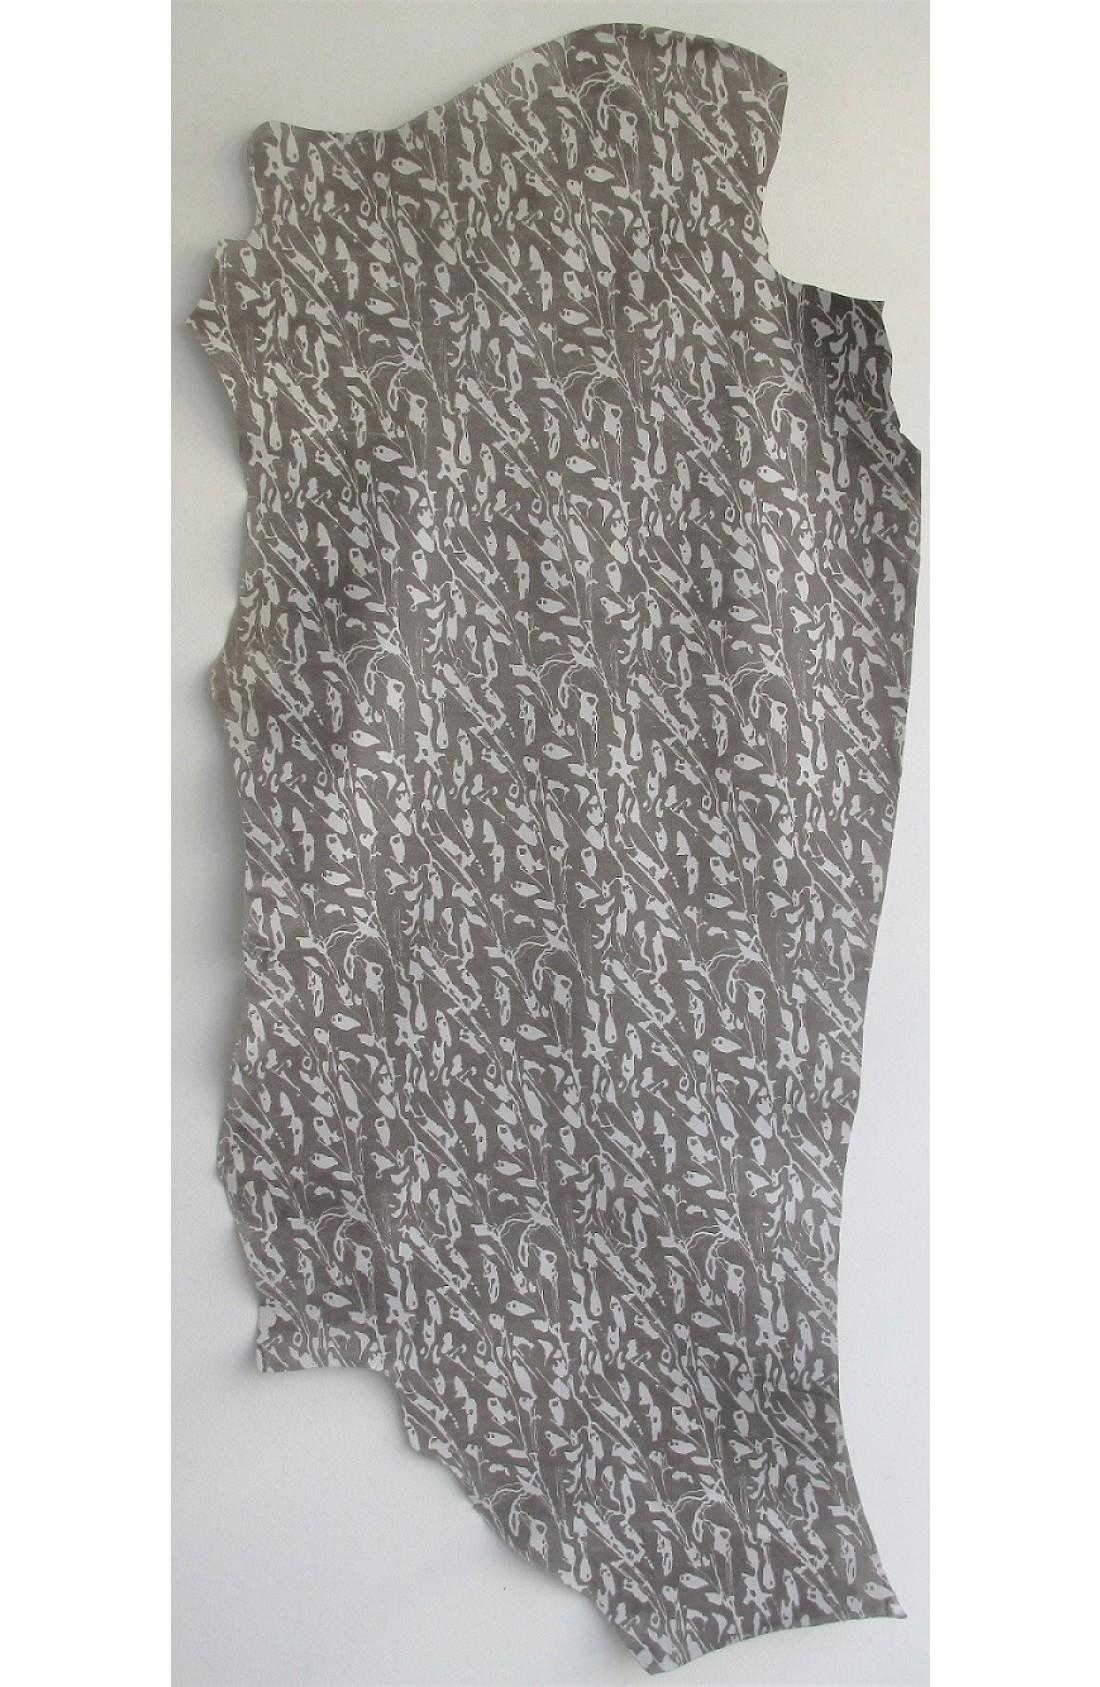 art. 72 MACULATO var.12 grigio polvere